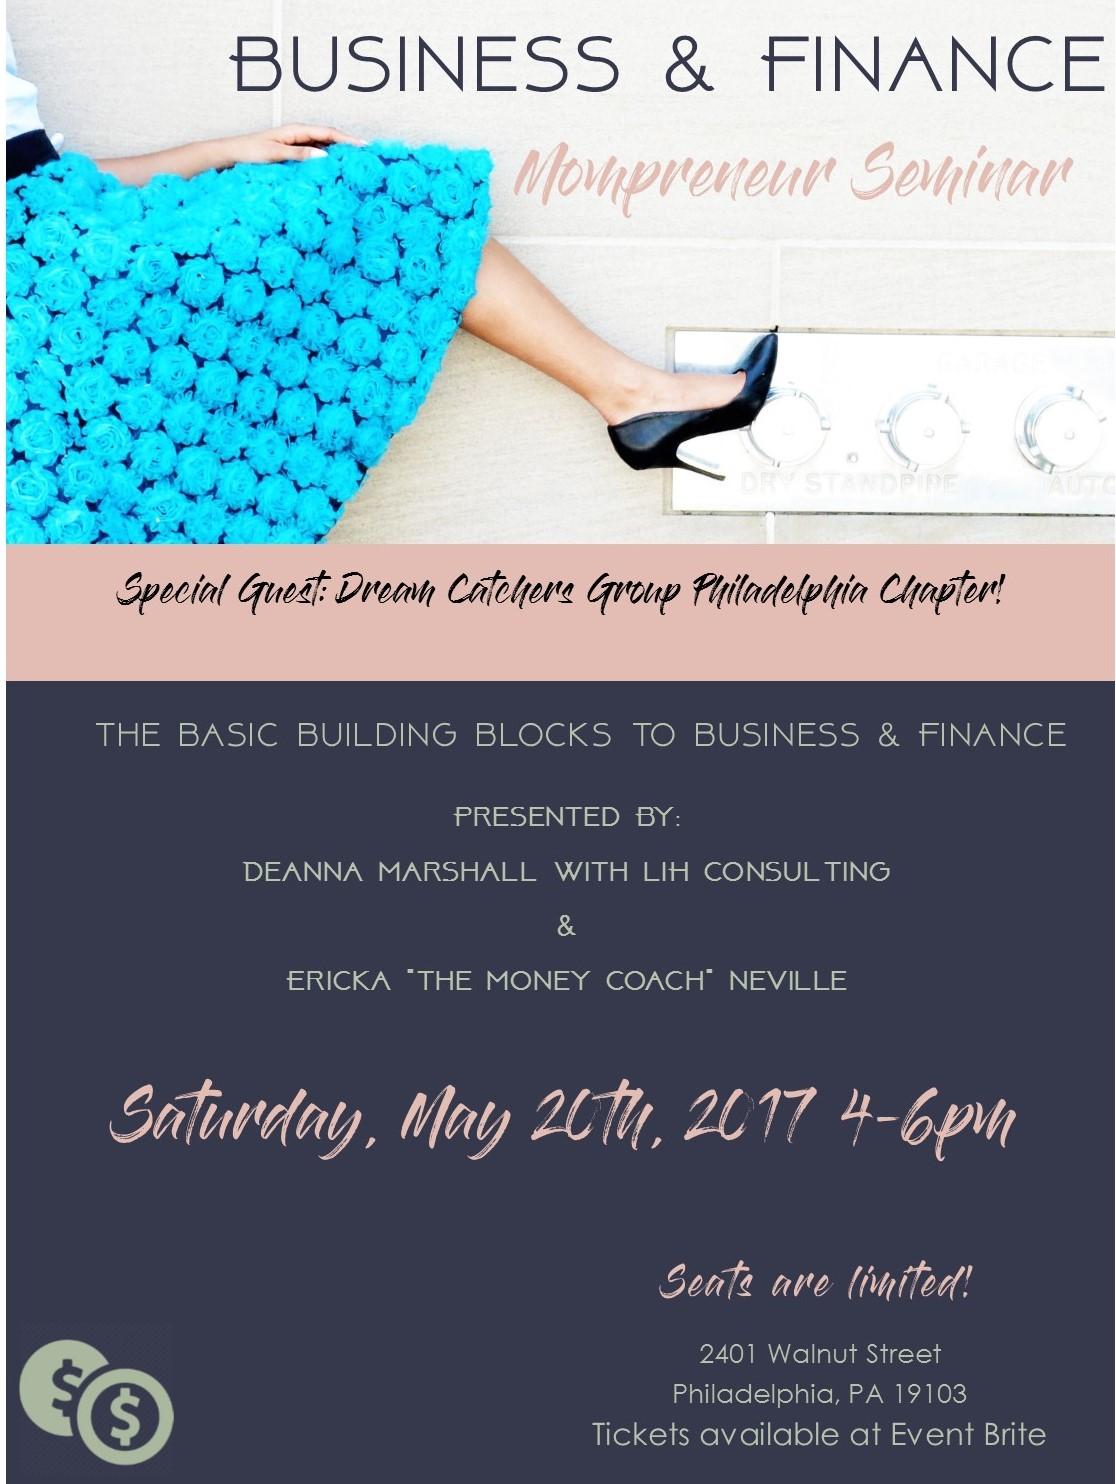 Business & Finance Mompreneur Seminar